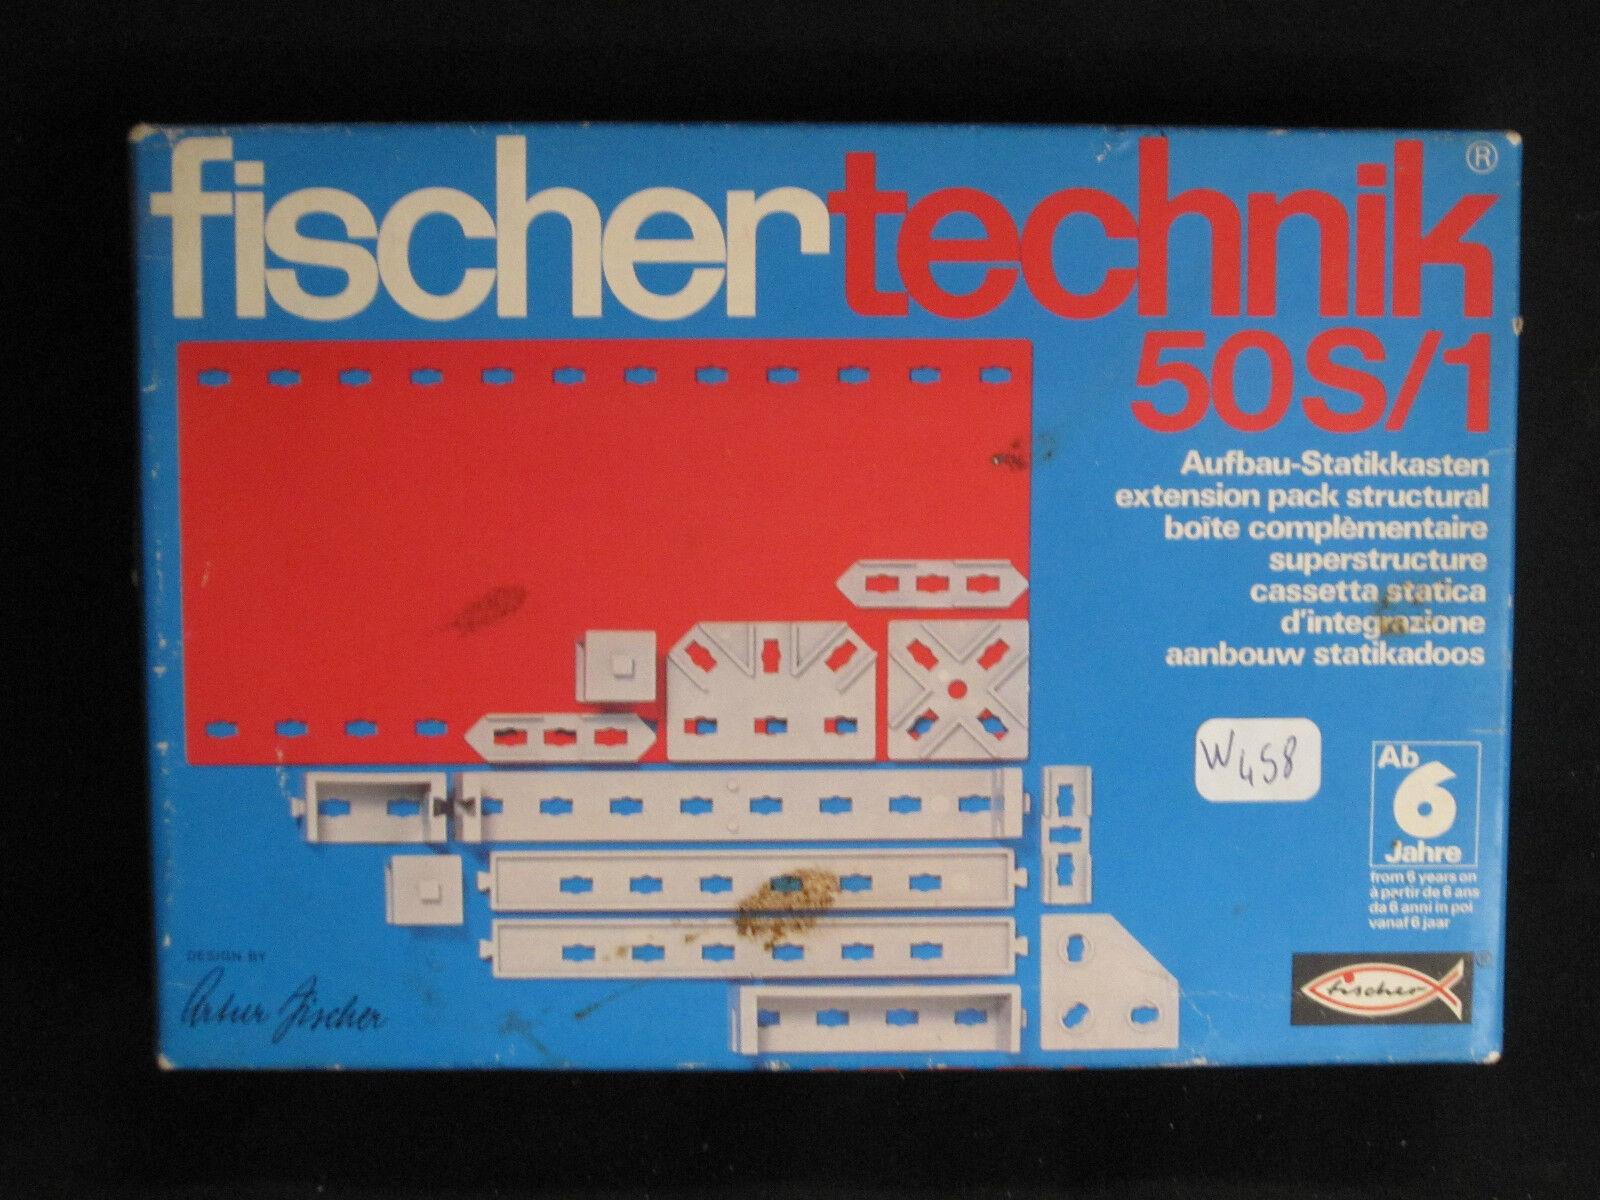 W458 FISCHER TECHNIK Réf. 50S 1 2 30160 5 TRES BON ETAT